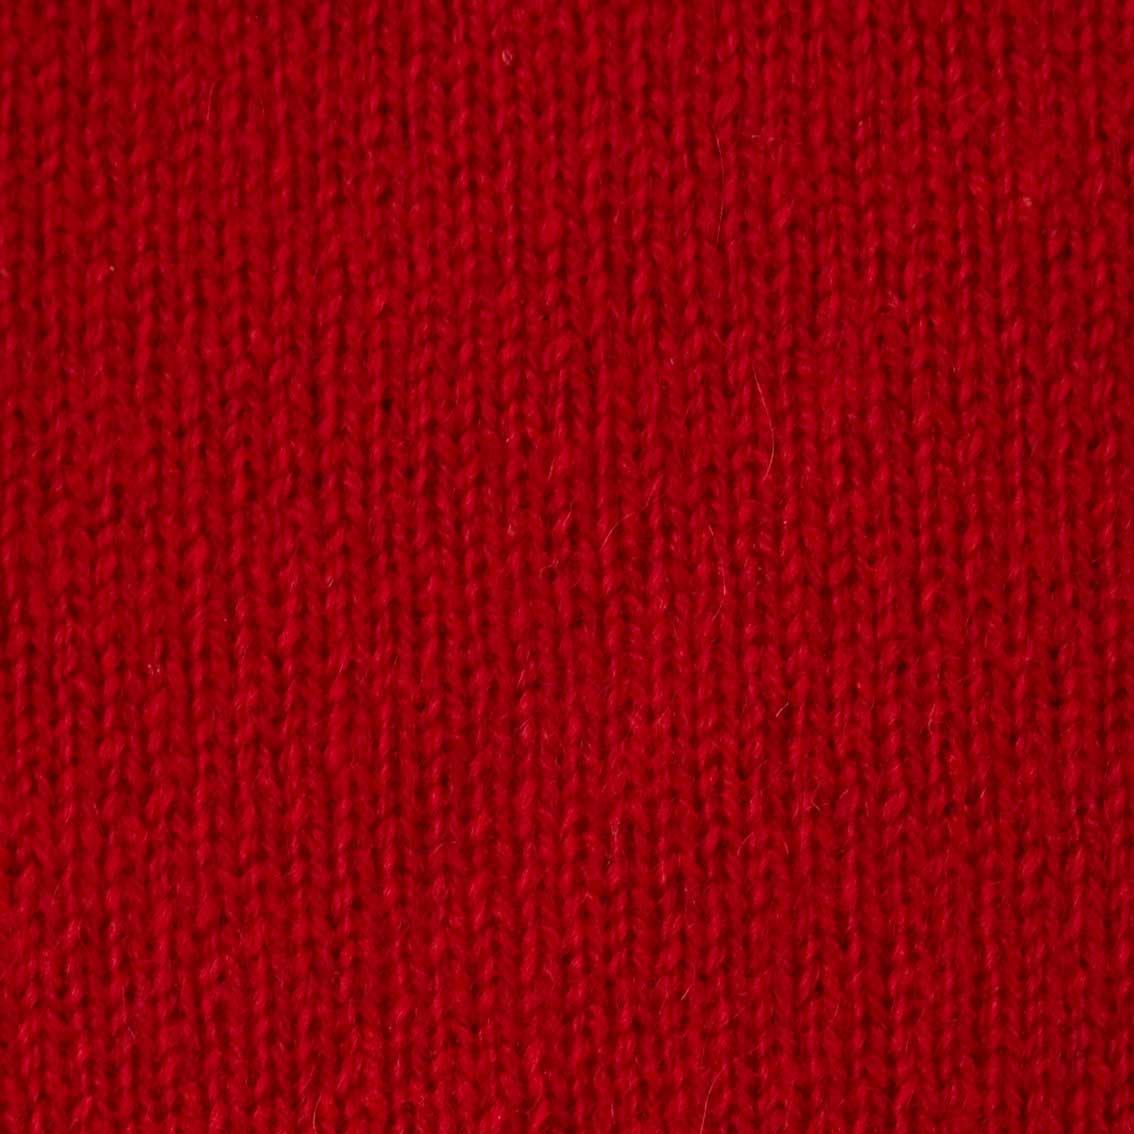 Ladies Cashmere Twin Set by Scotweb da36d6bf9